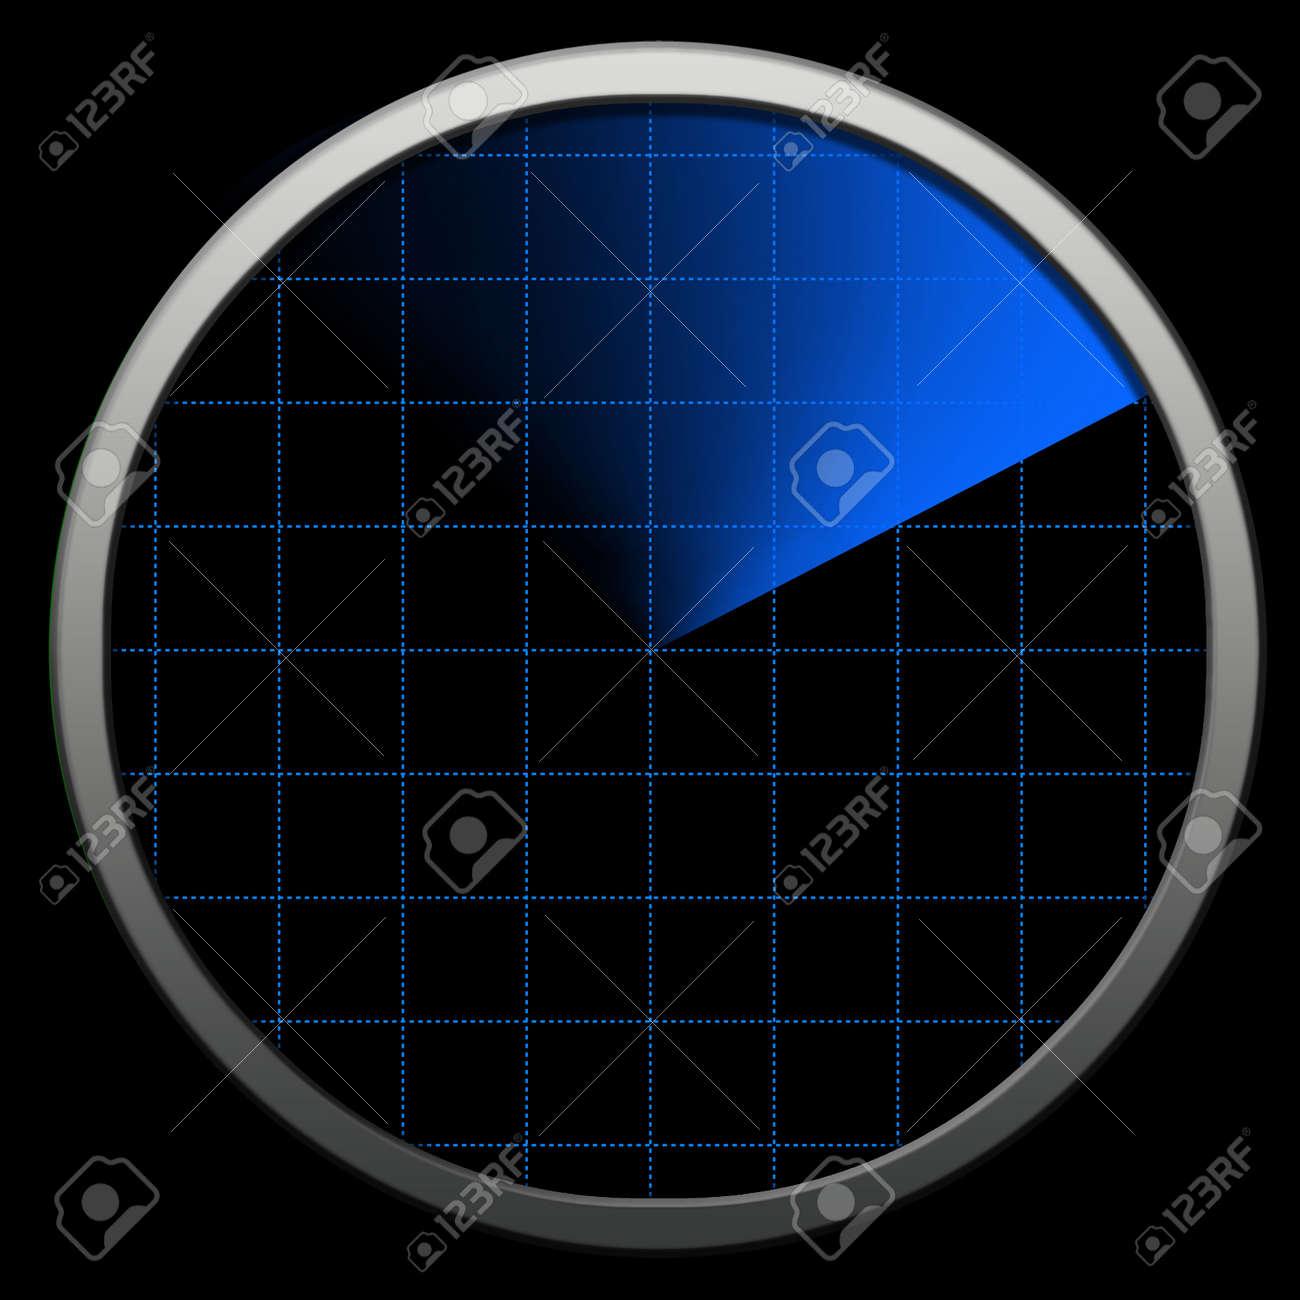 Globe bluetooth Radar.Radar tecnology Stock Photo - 2600720